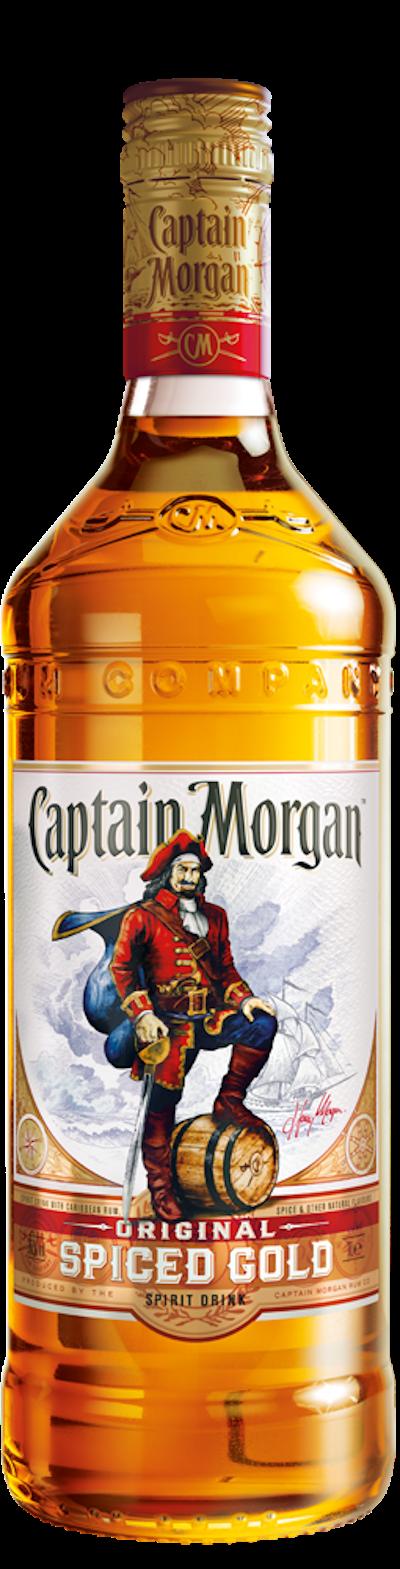 Captain Morgan - Spiced Gold Rum